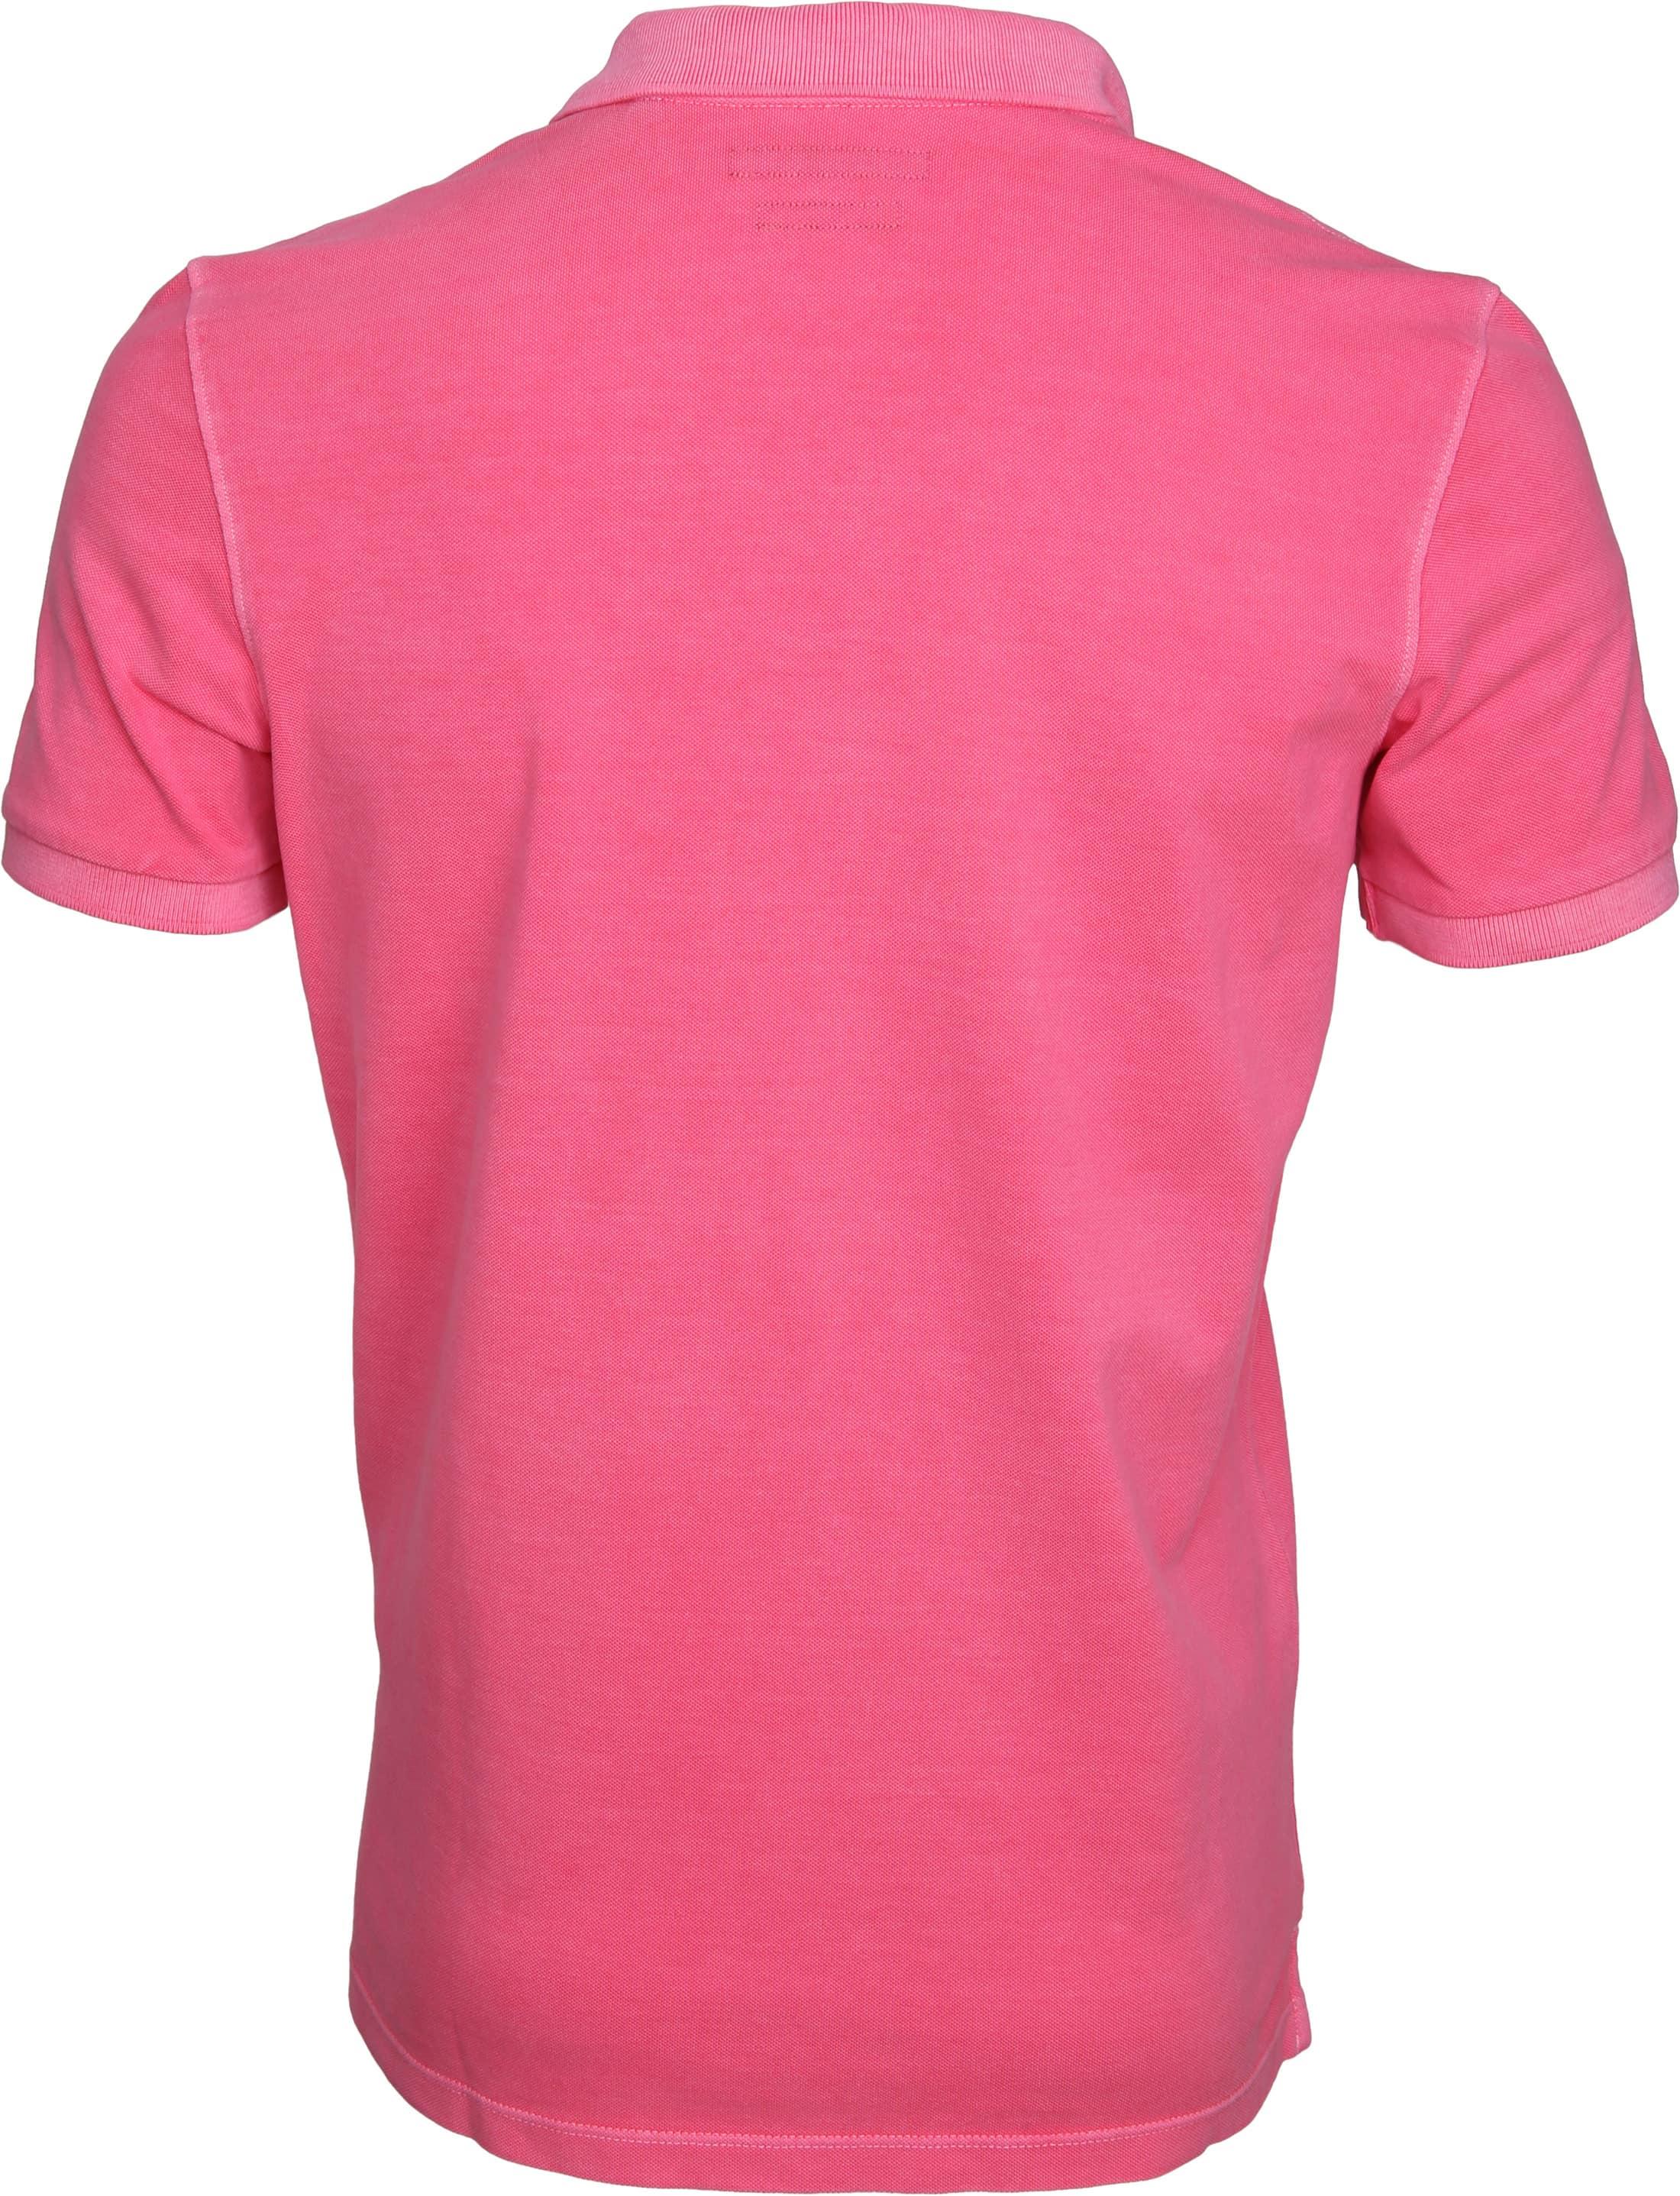 Marc O'Polo Poloshirt Garment Dyed Rosa foto 2